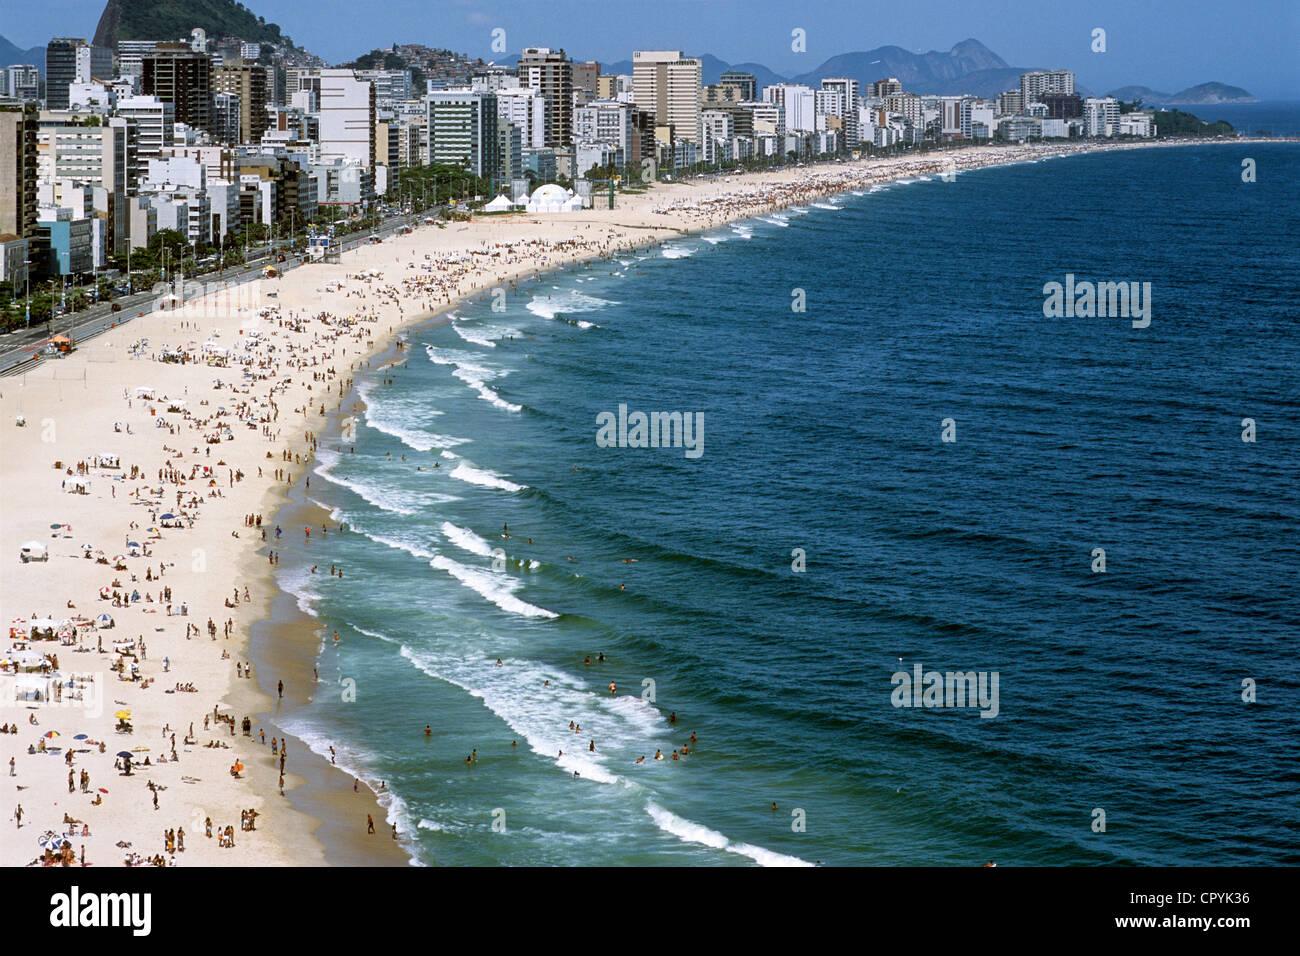 Brazil, Rio de Janeiro, cariocas landscape UNESCO World Heritage, Ipanema Beach, located between the Morro Dois - Stock Image